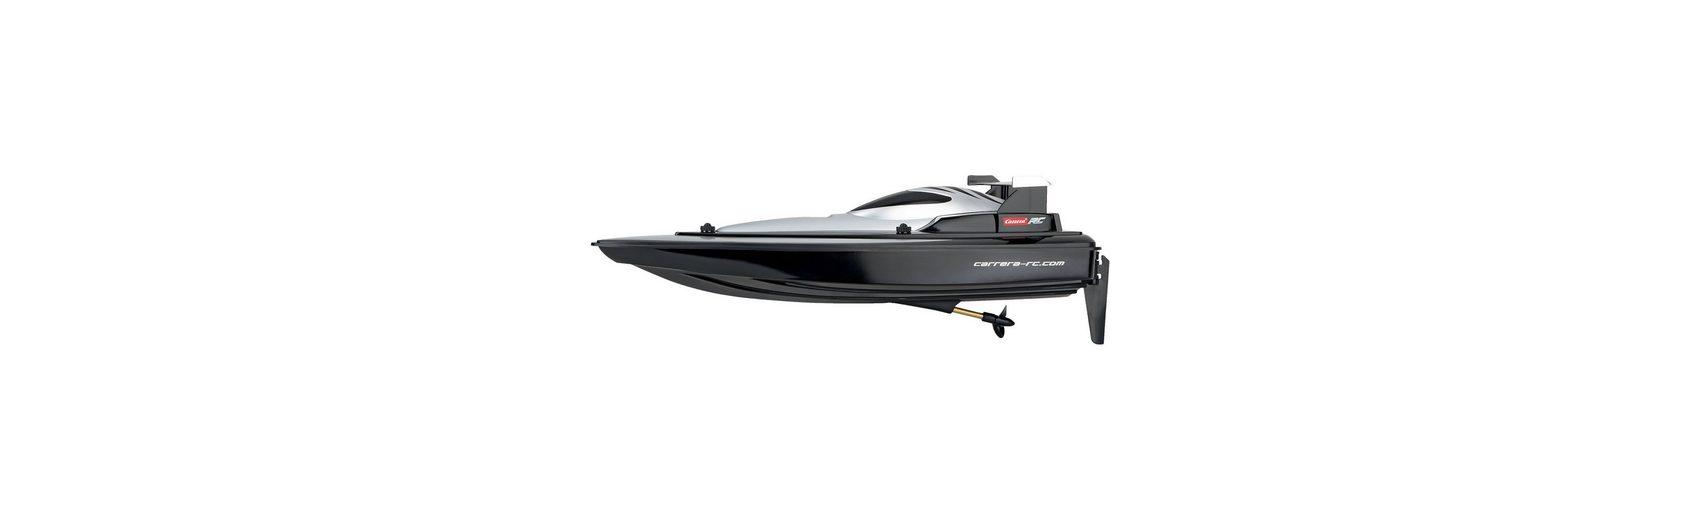 Carrera RC Speedboot 25 km/h 2.4 GHz